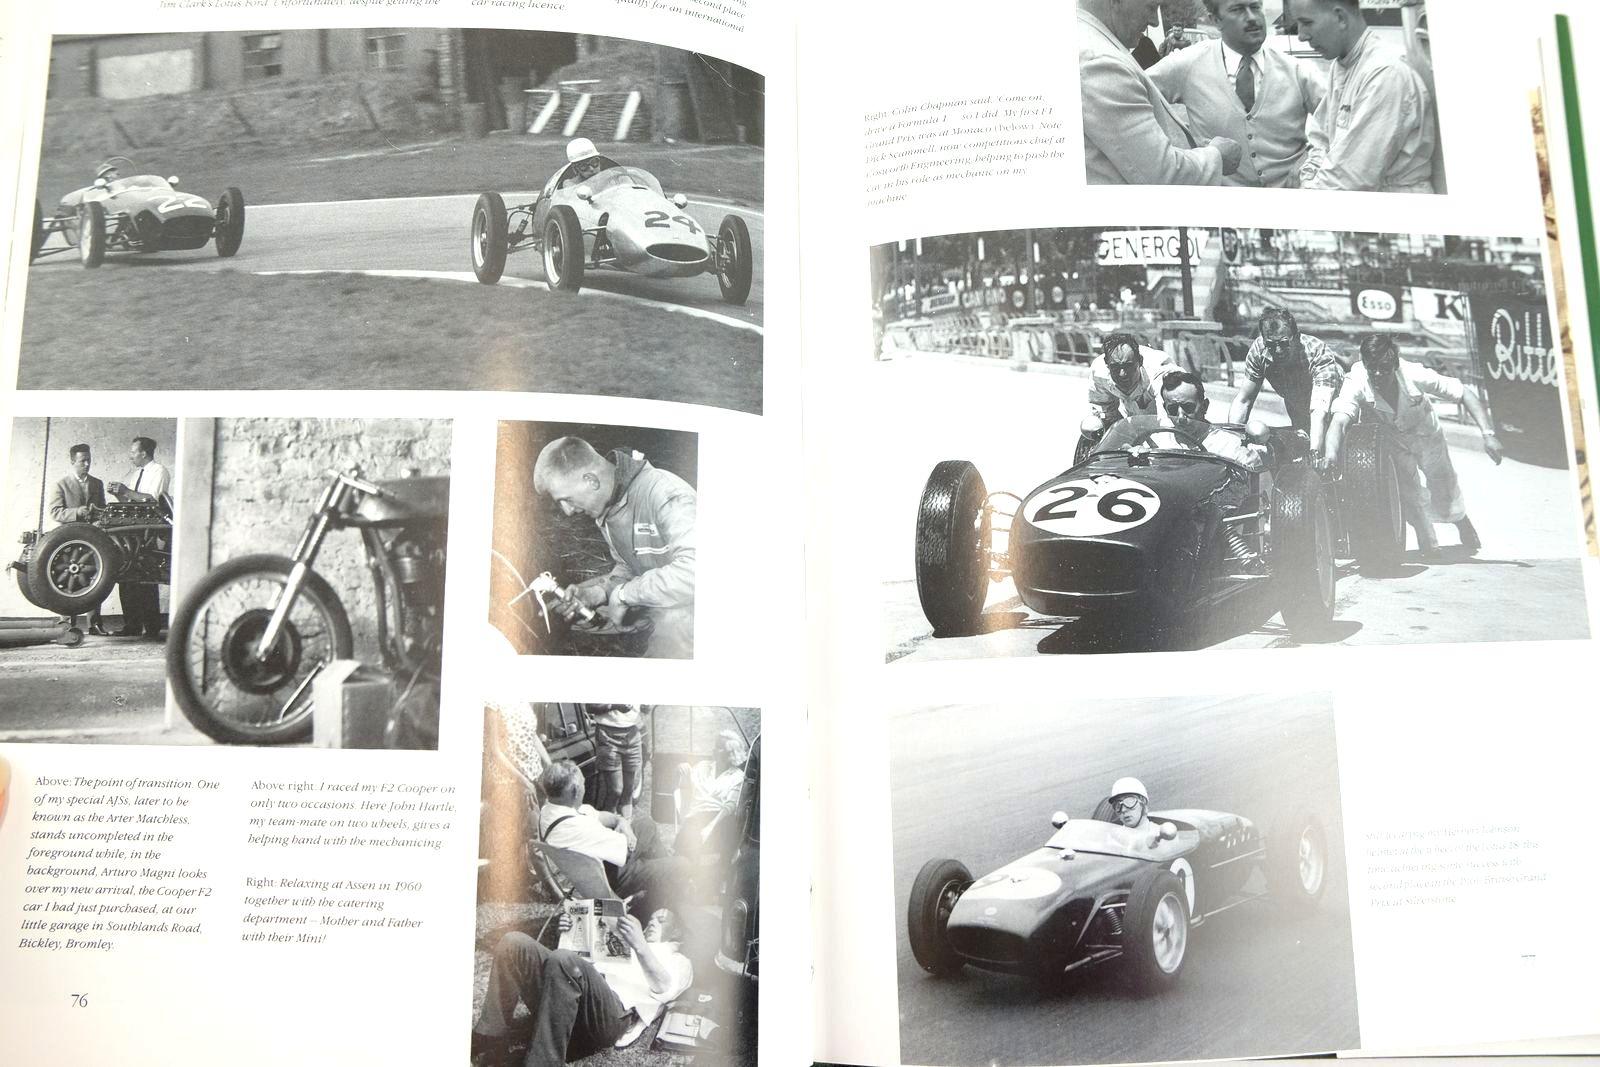 Photo of JOHN SURTEES WORLD CHAMPION written by Surtees, John Henry, Alan published by Hazleton Publishing (STOCK CODE: 2132980)  for sale by Stella & Rose's Books